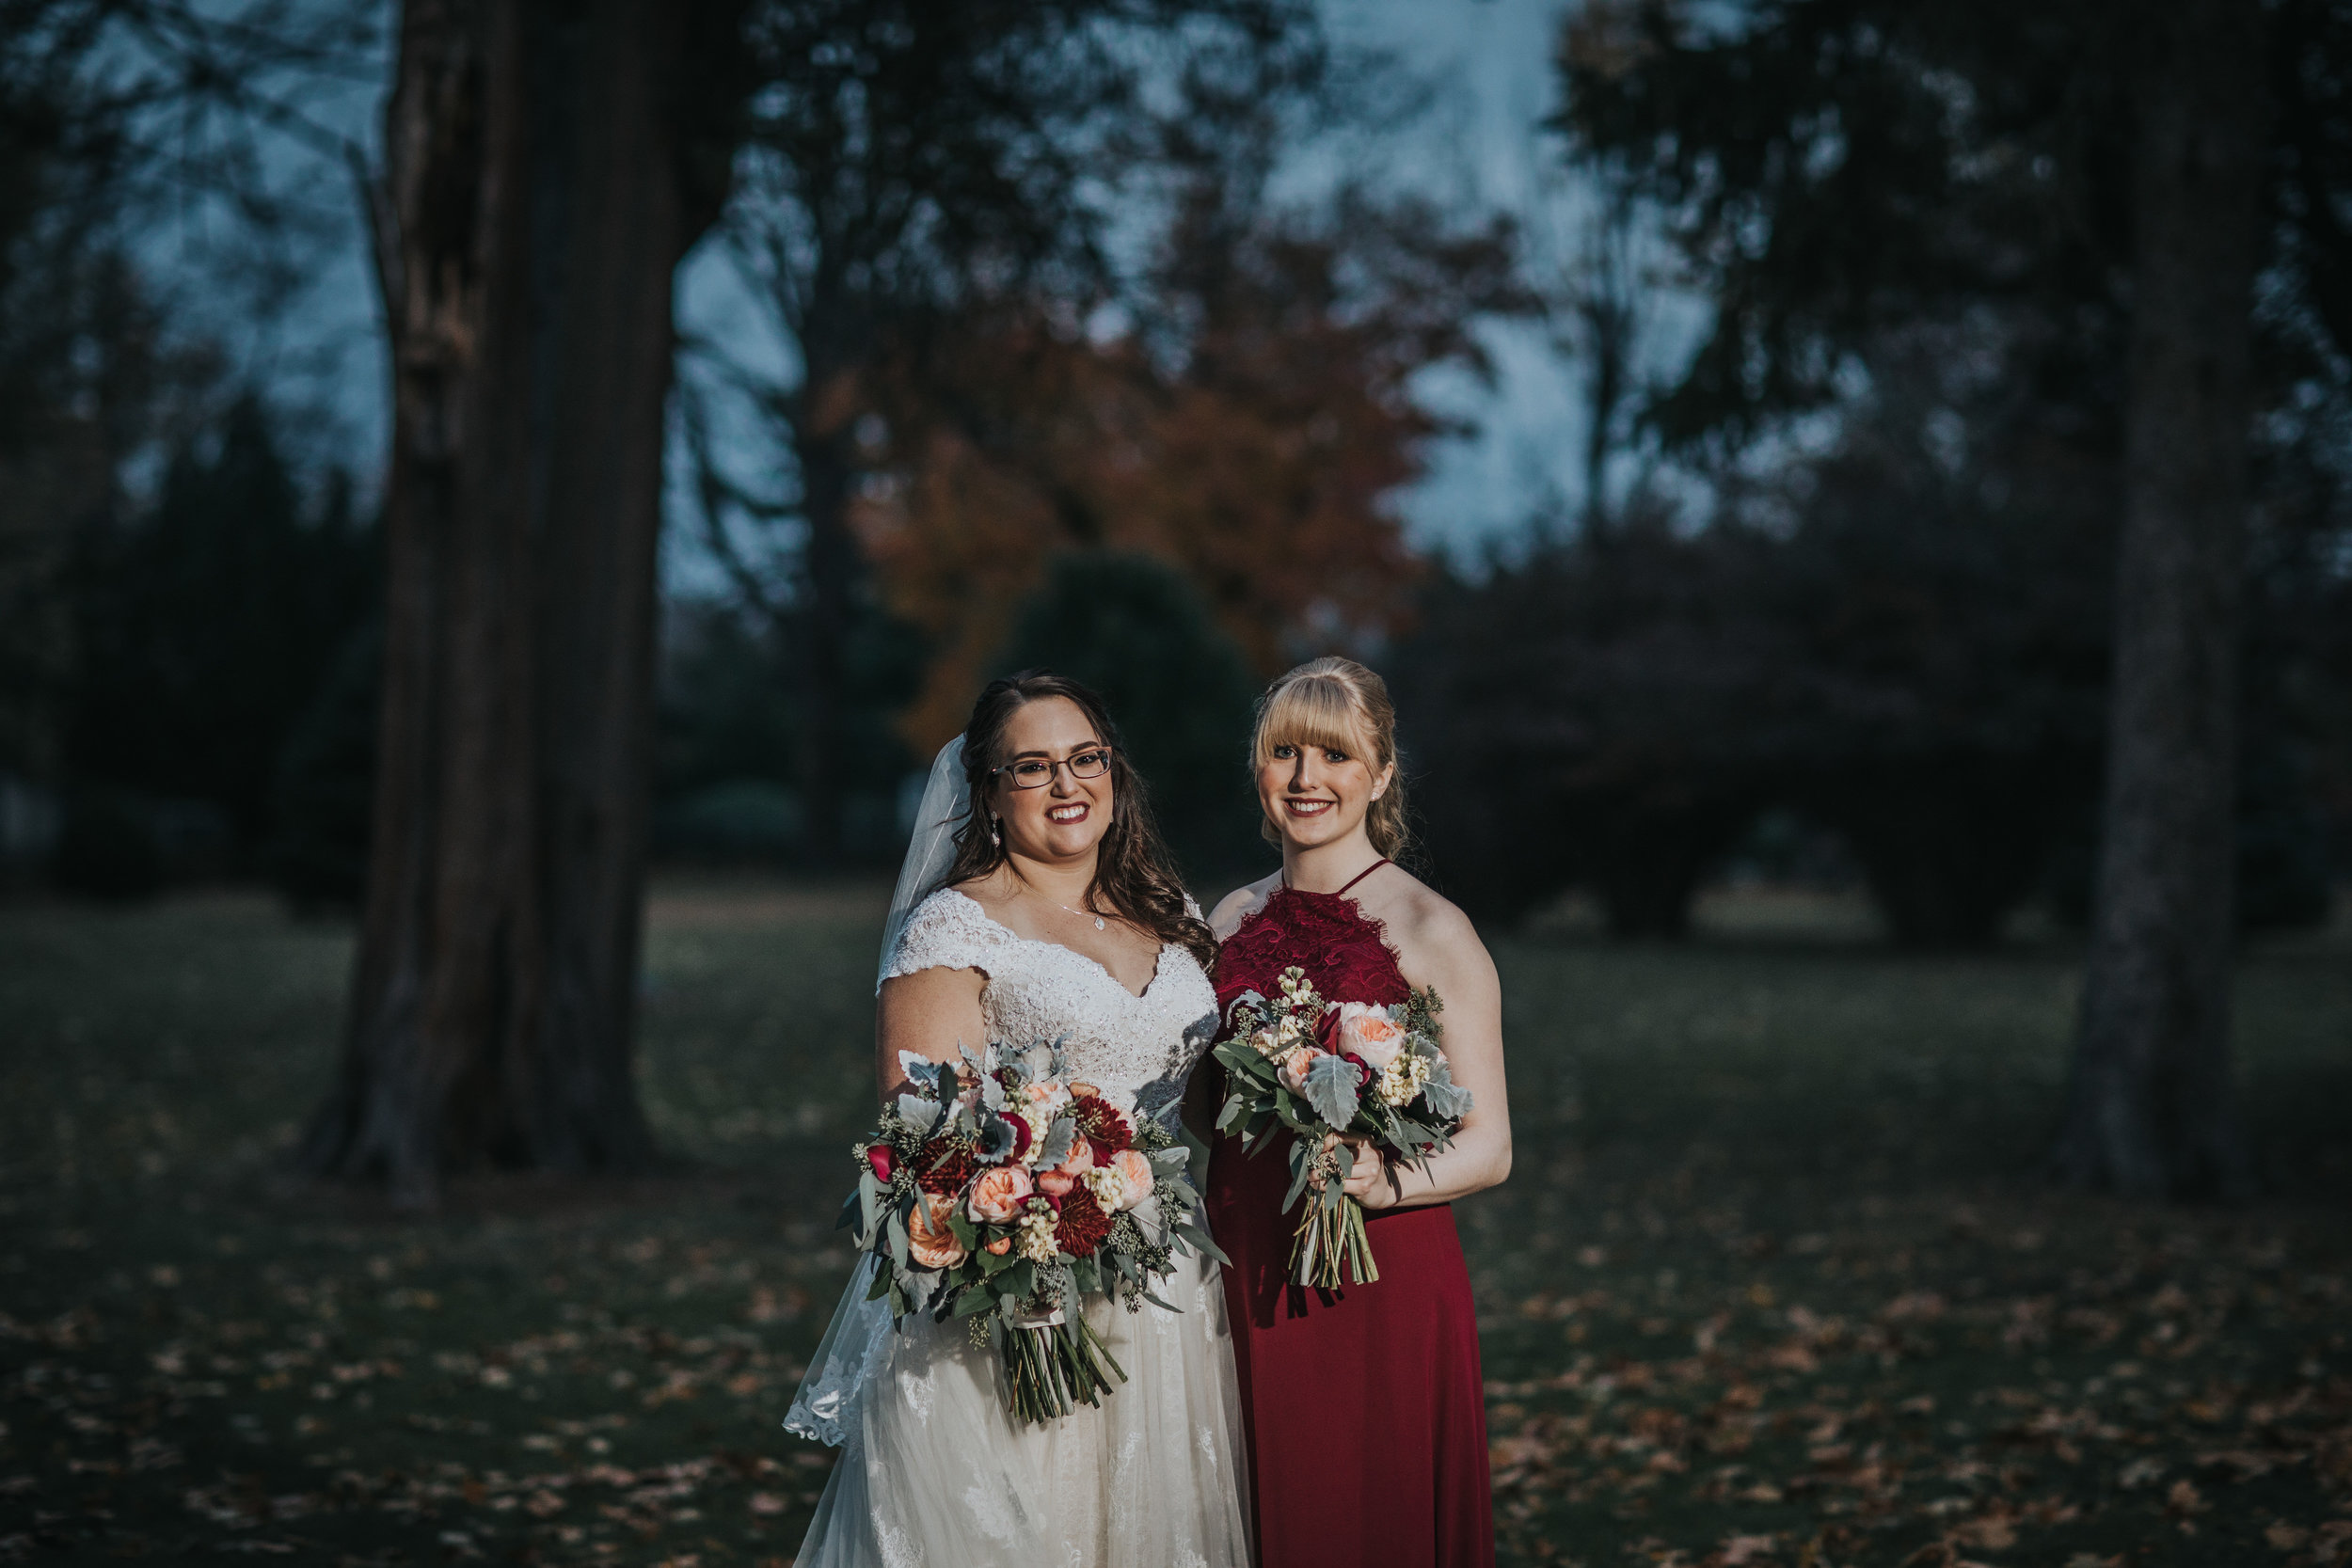 New-Jersey-Wedding-Photography-Fishers-Tudor-House-JennaLynnPhotography-BridalParty-Kathleen&Eddie-18.jpg